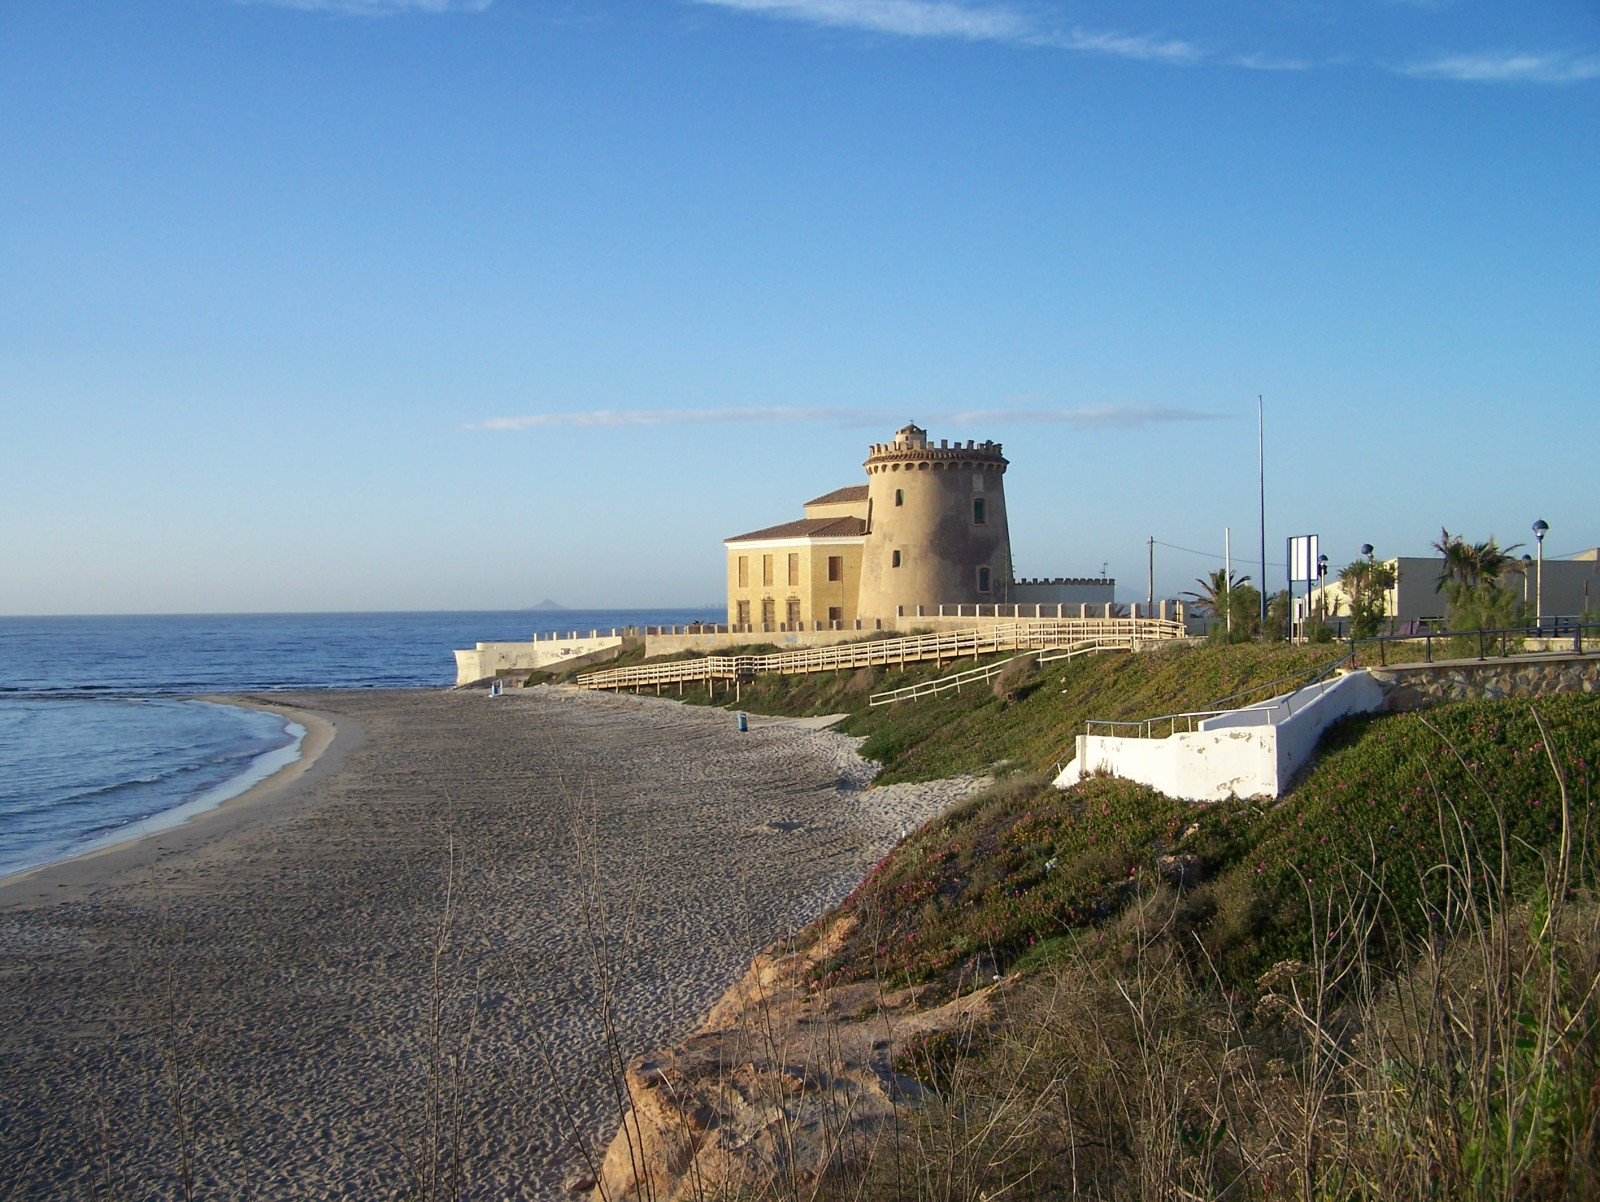 http://www.med-properties.com/wp-content/uploads/2014/05/playa-del-conde-LA-TORRE